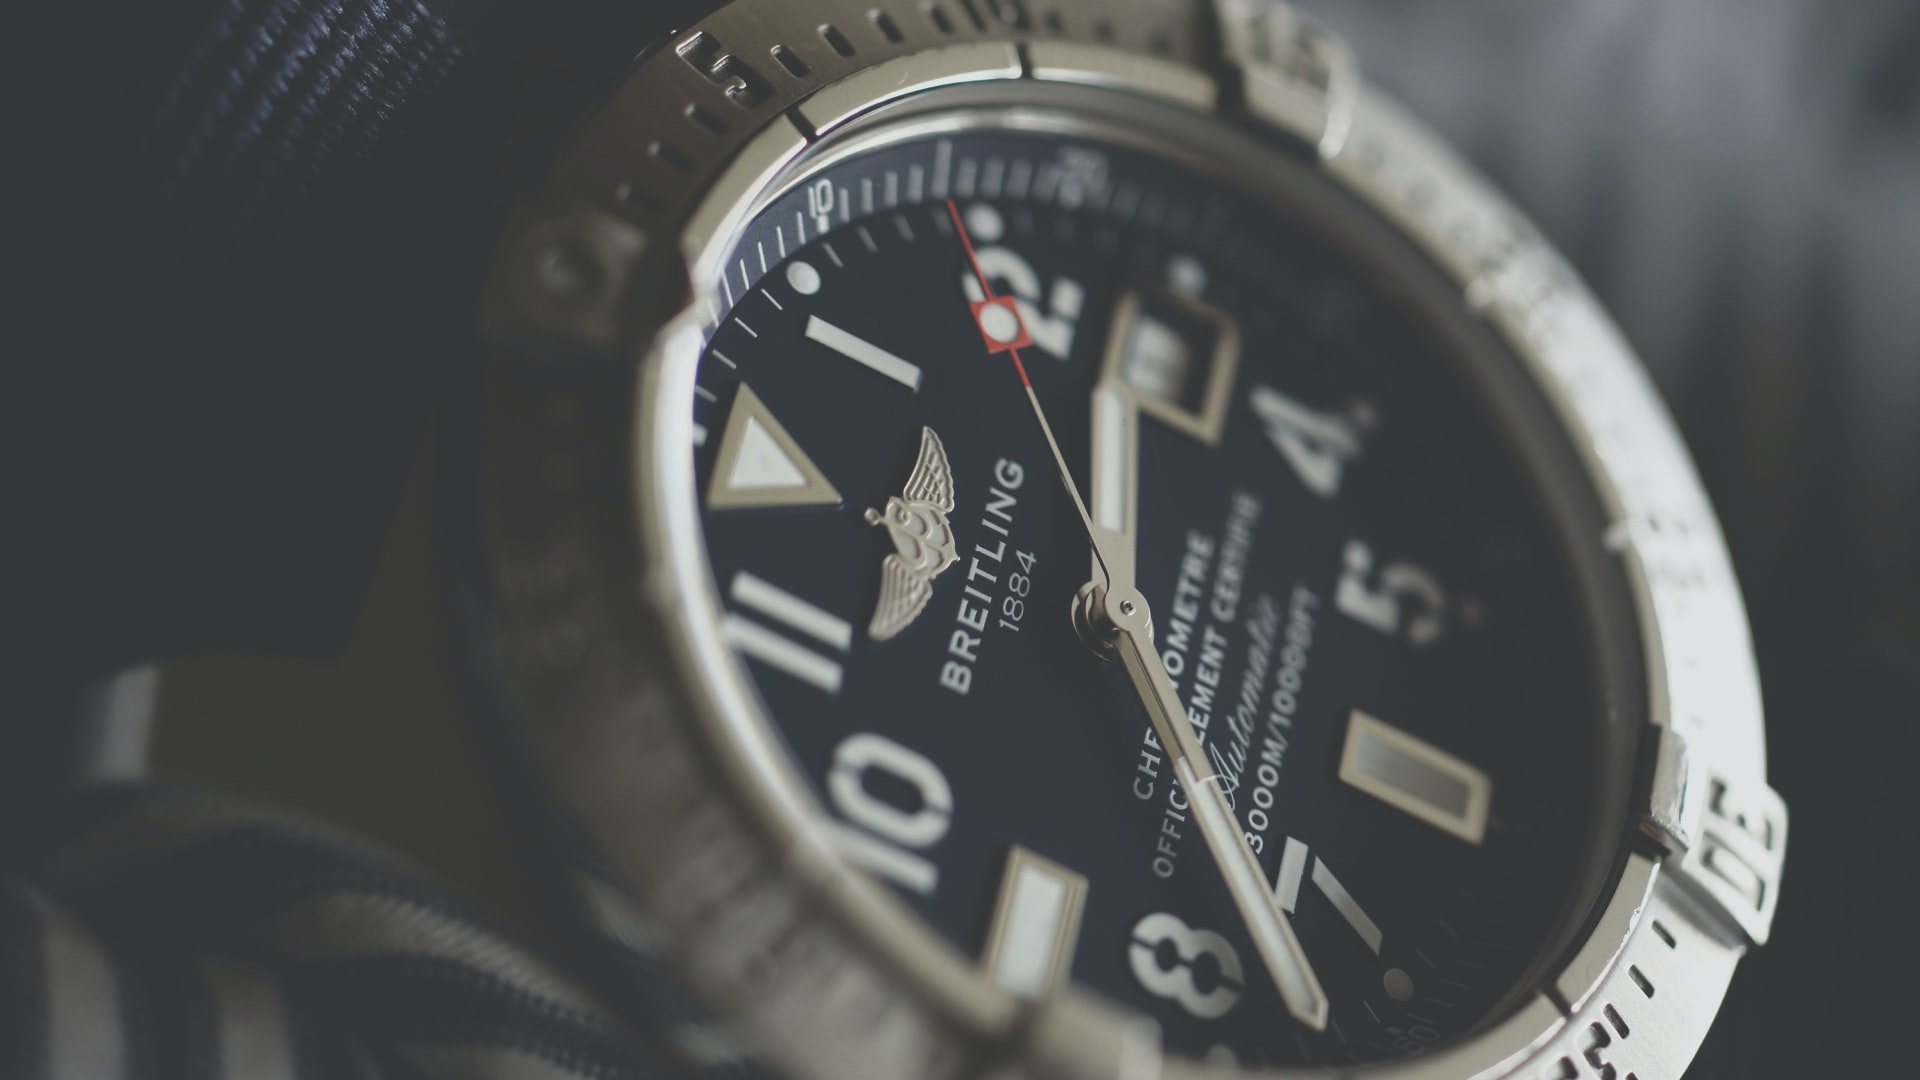 analog watch reading at 2:38